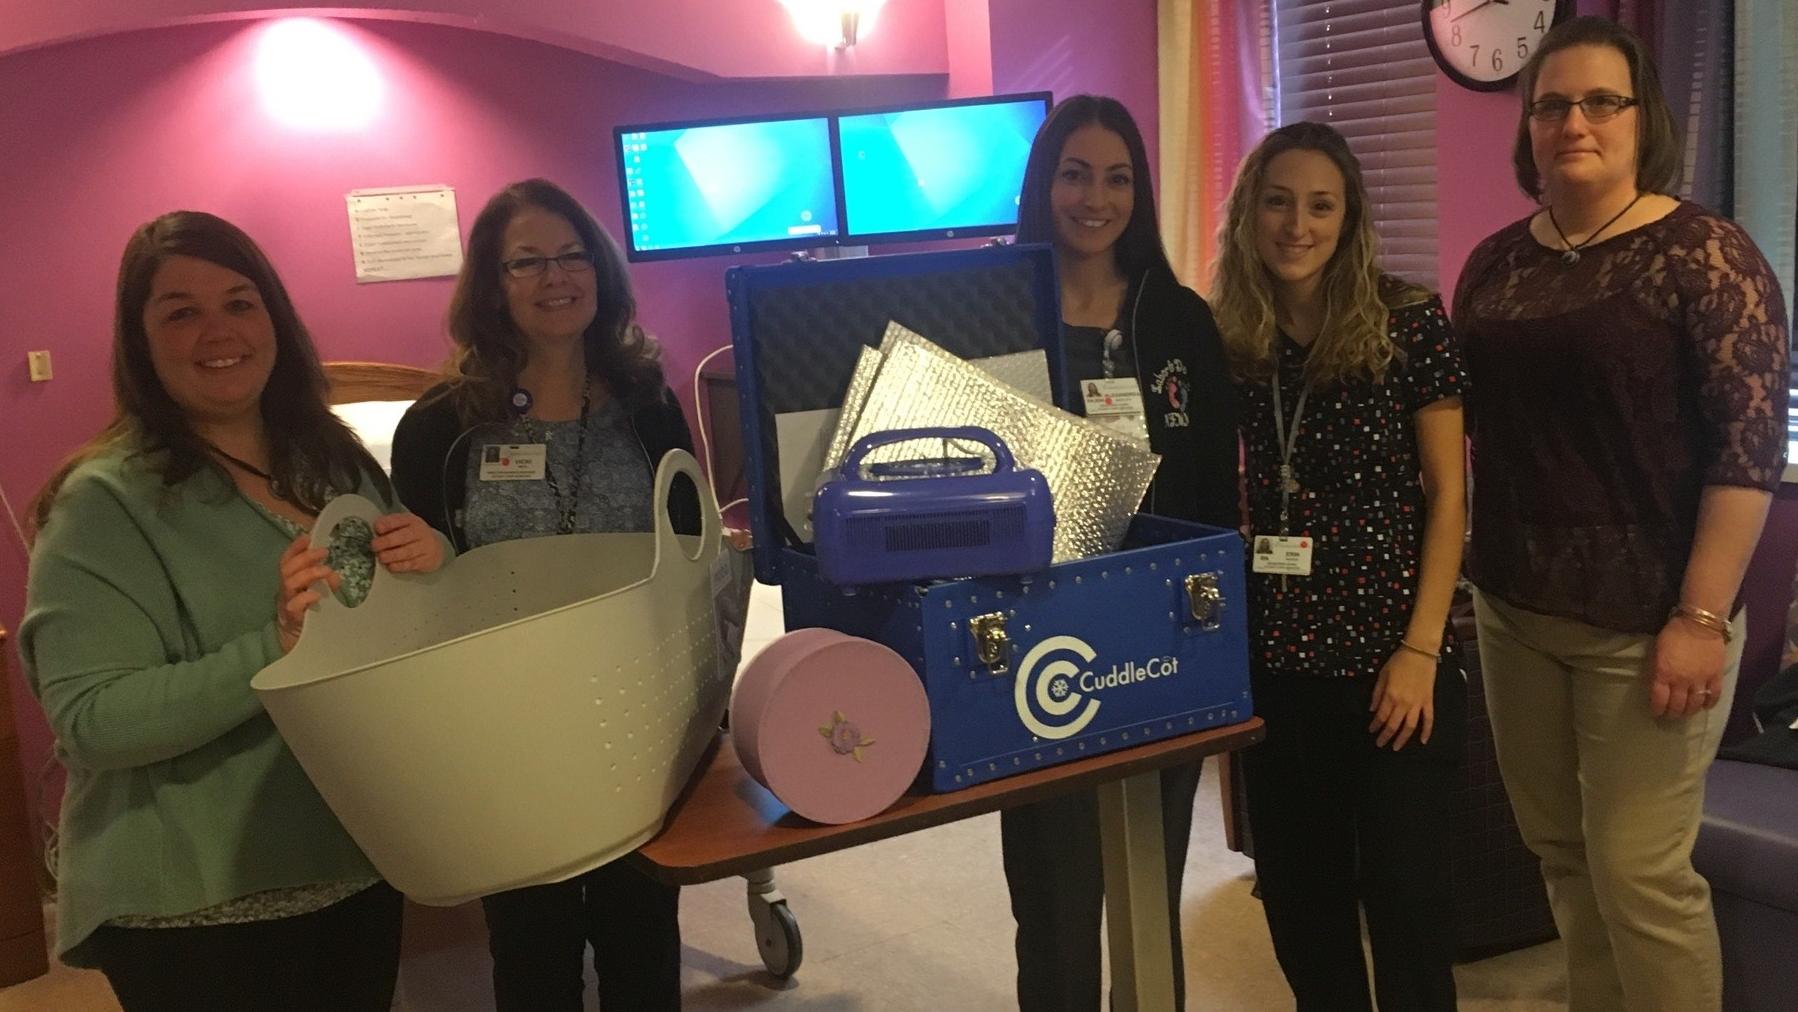 Niagara Memorial Hospital presentation of cuddle cot and Moba basket.